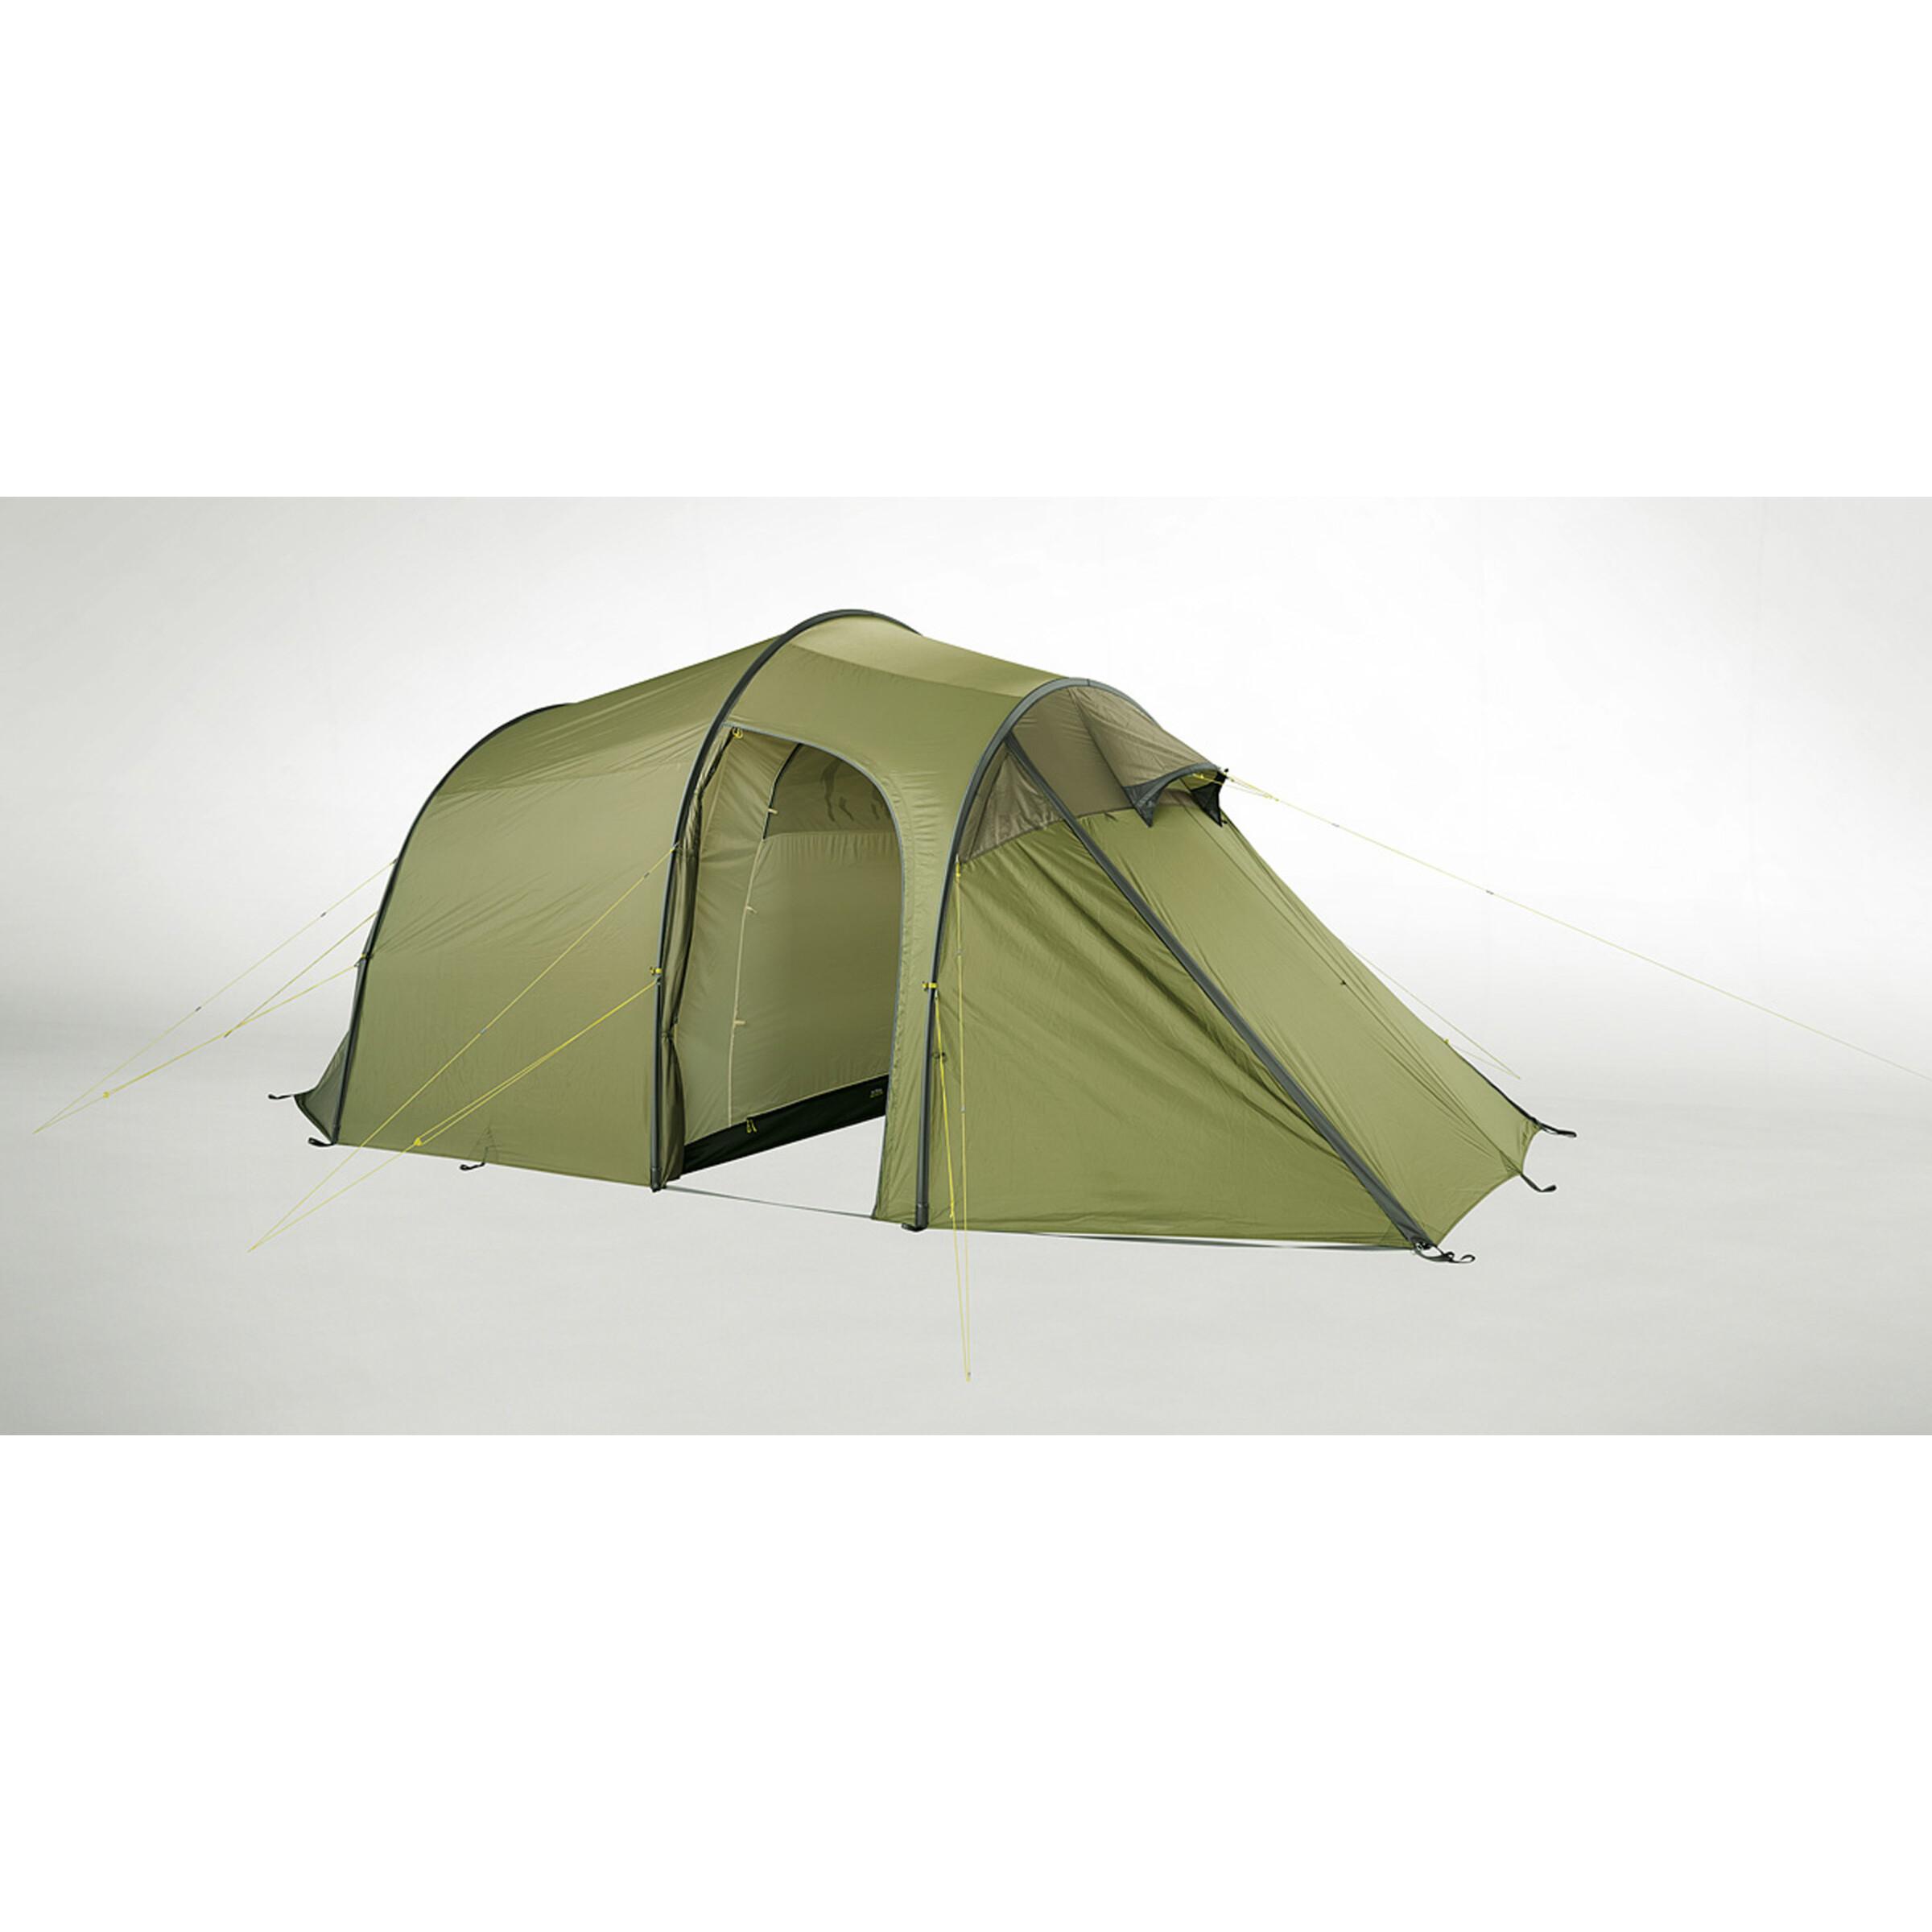 tatonka-family-camp-tent-light-olive-2.jpg